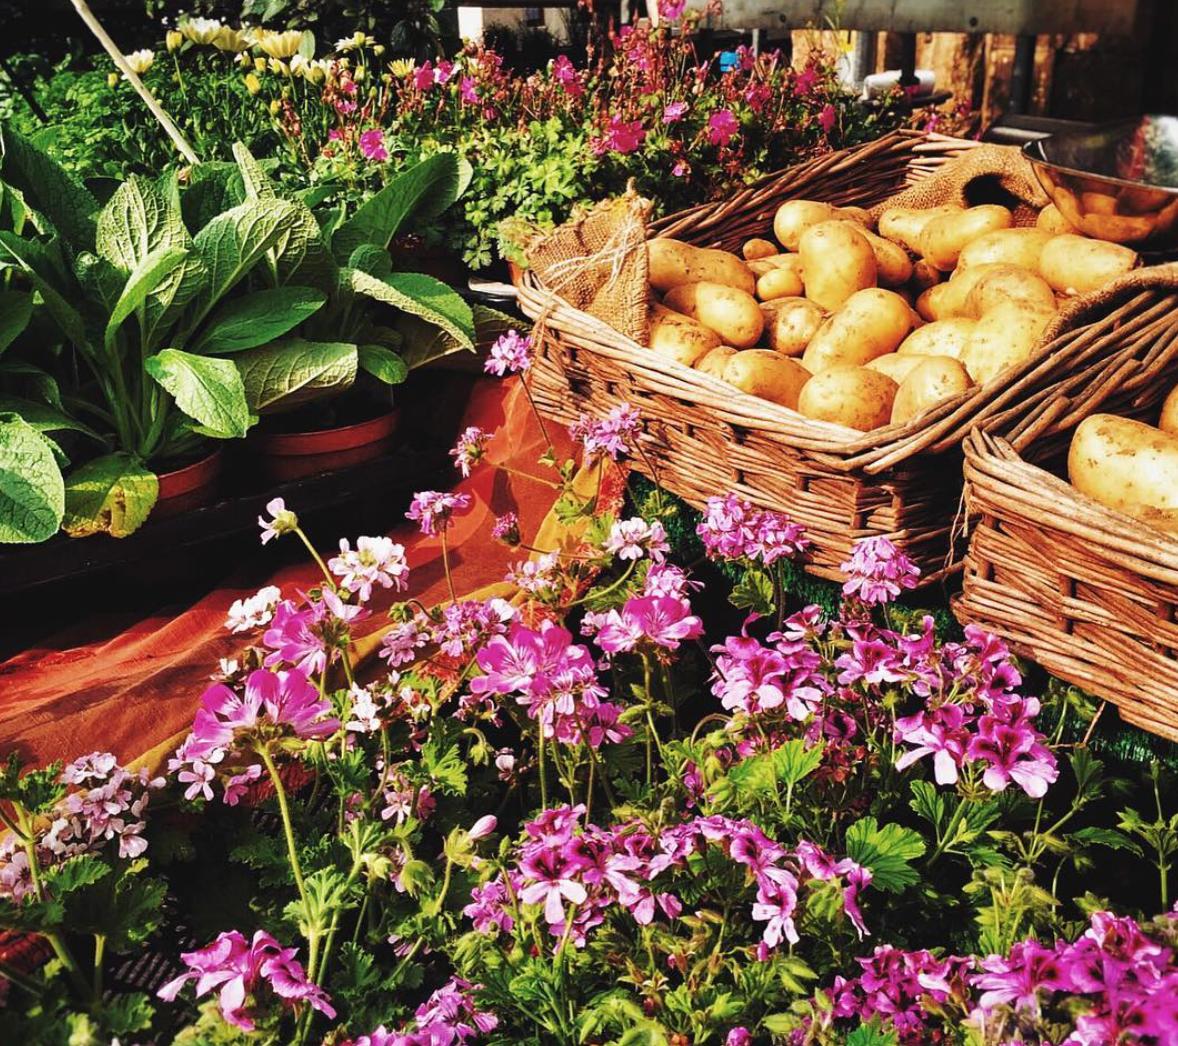 Petworth Farmer's Market